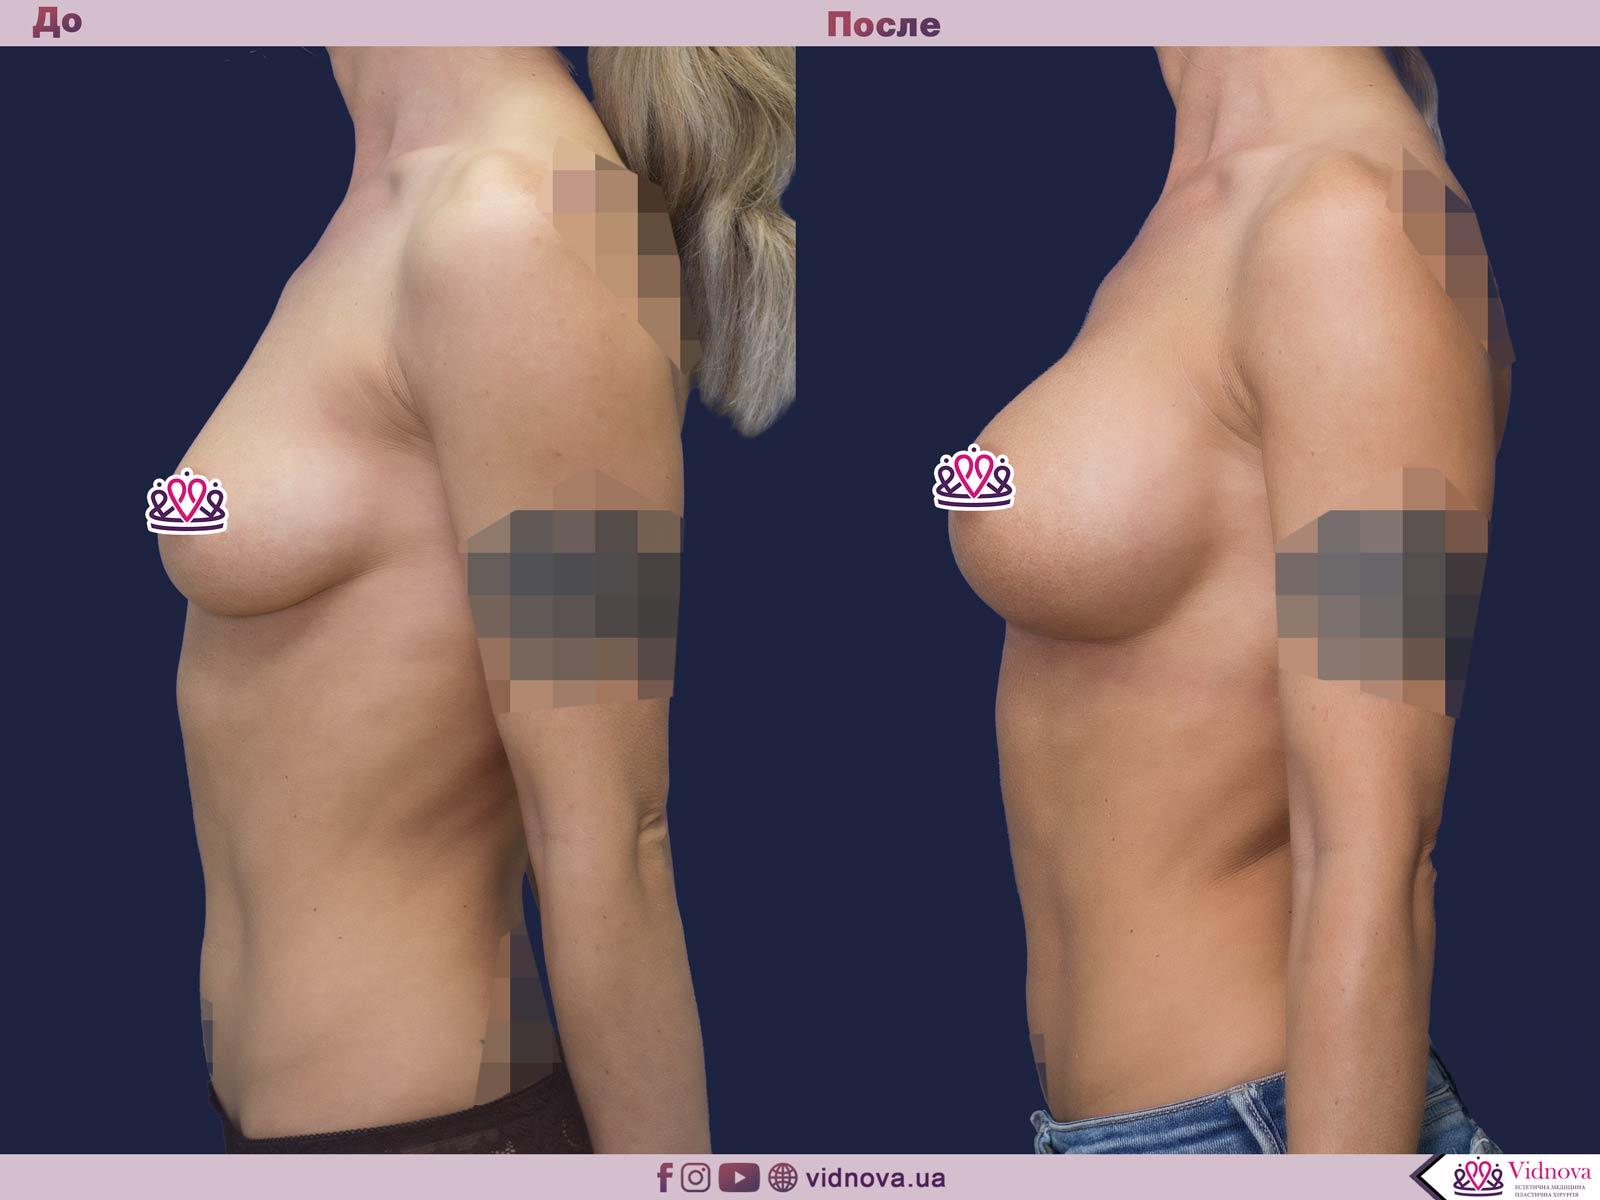 Увеличение груди: Фото ДО и ПОСЛЕ - Пример №51-3 - Клиника Vidnova